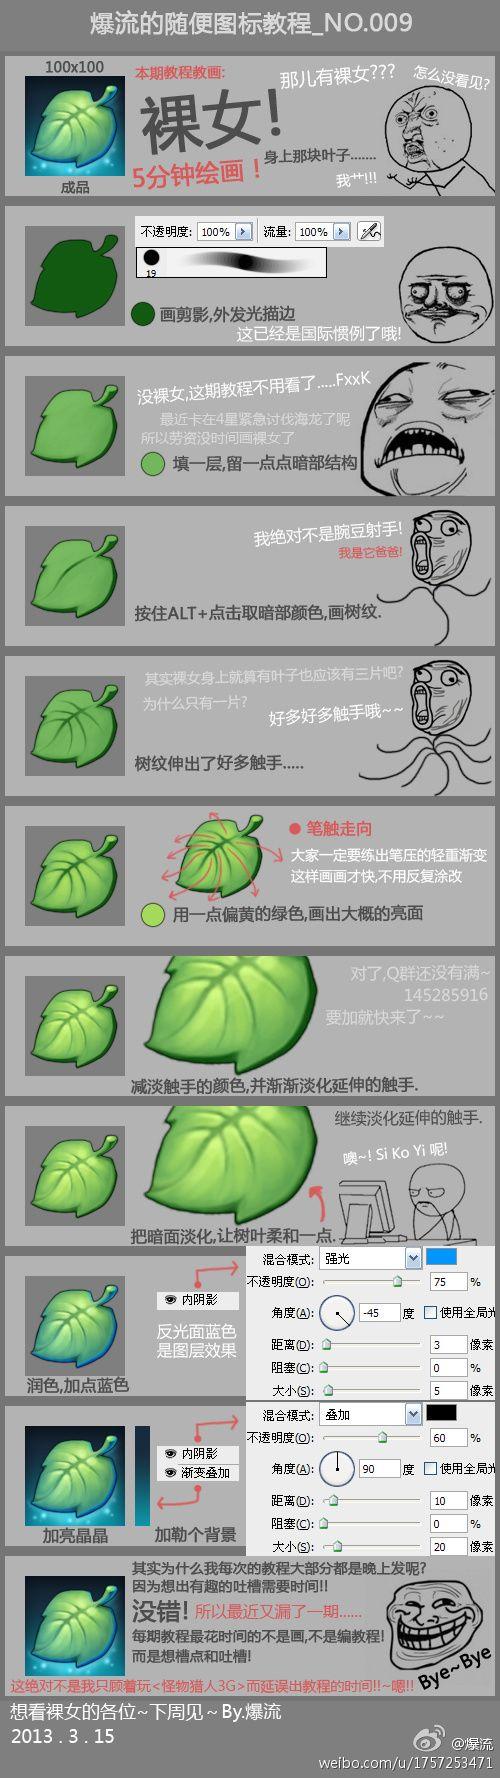 爆流的照片 - 微相册 - leaf icon tuto